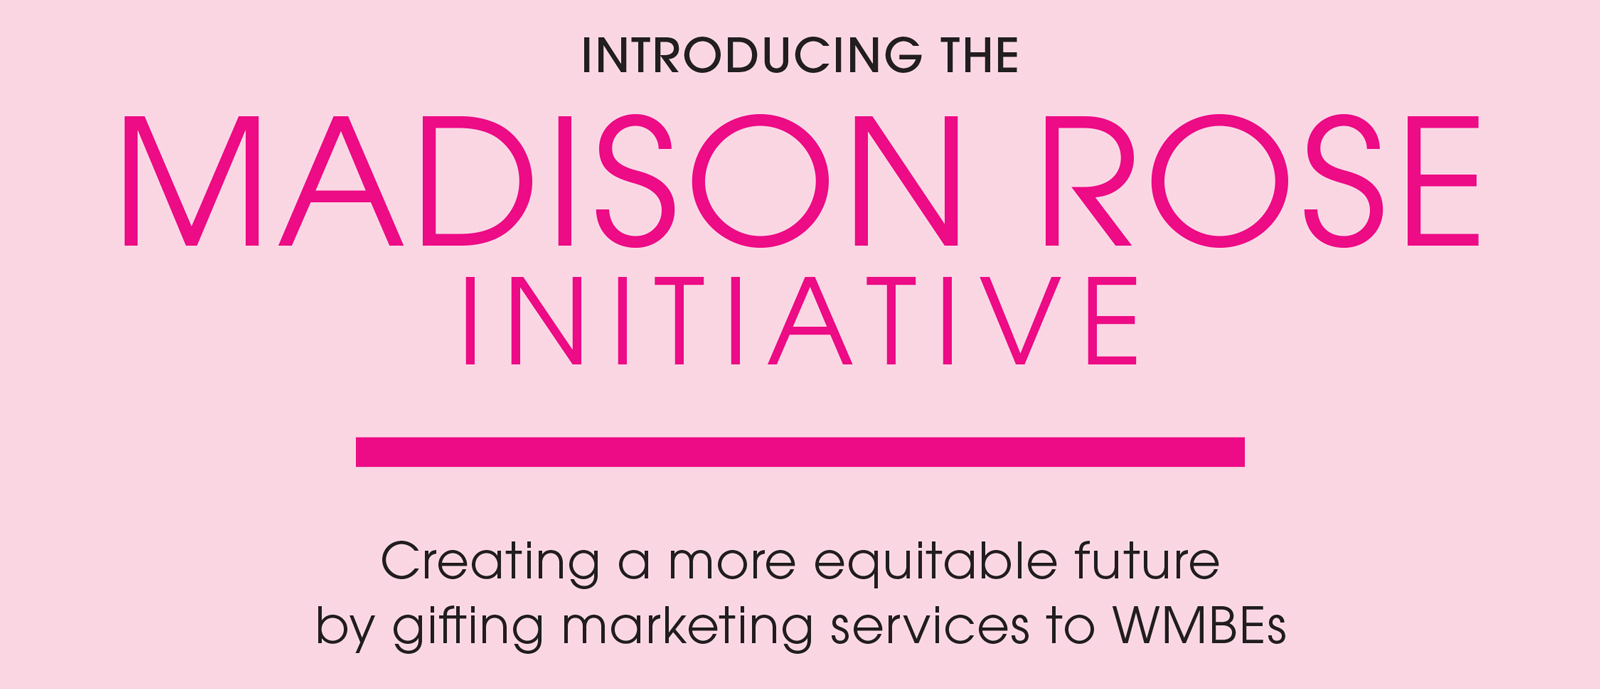 The Madison Rose Initiative